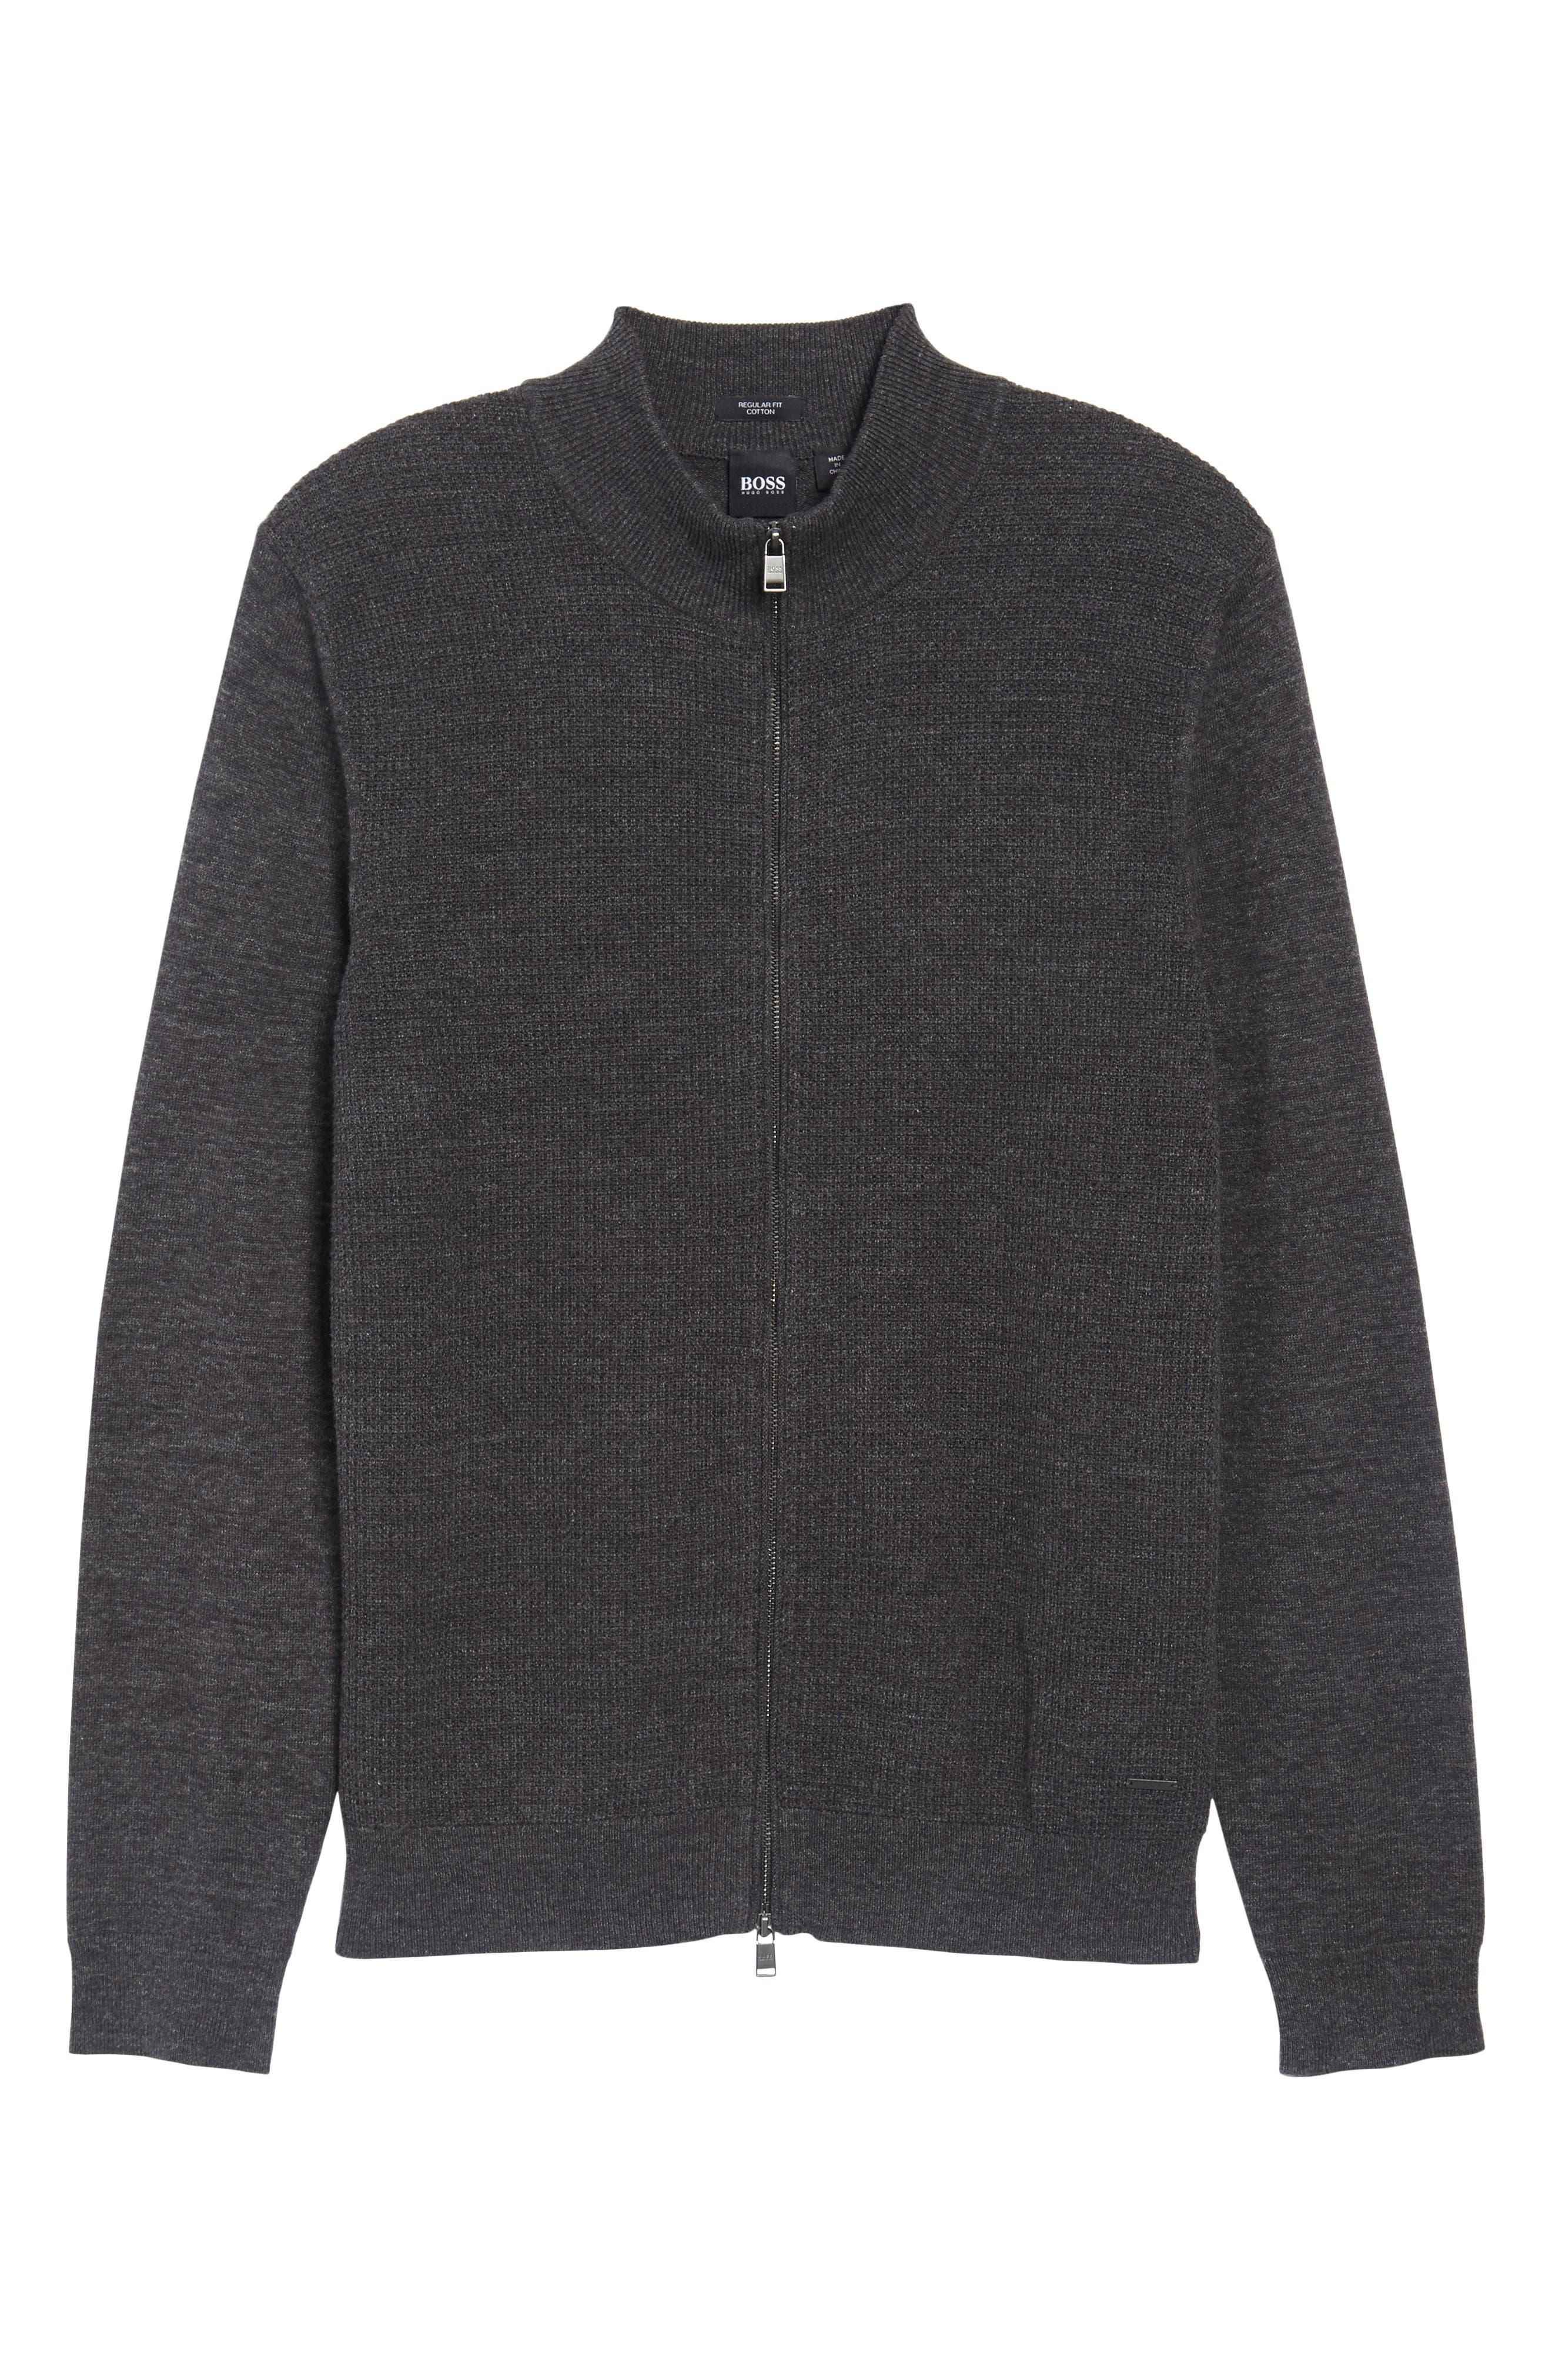 Devino Cotton Zip Jacket,                             Alternate thumbnail 6, color,                             Grey